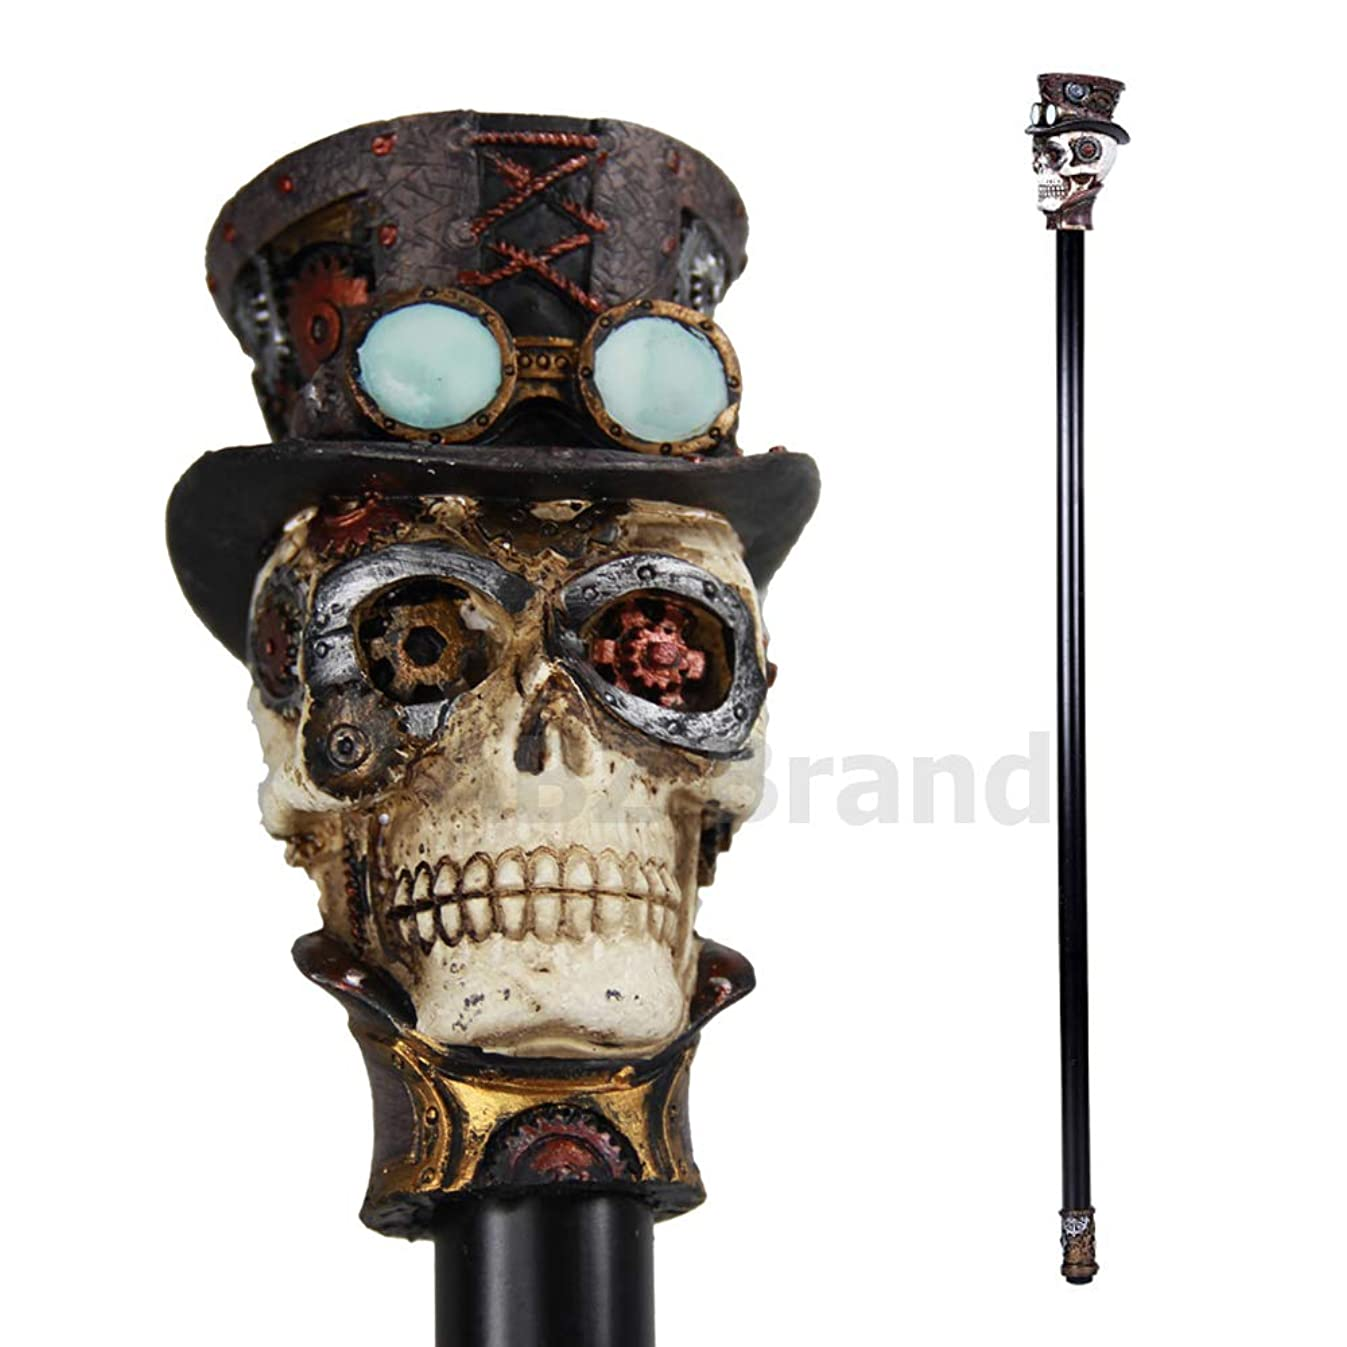 ABZ Brand Steampunk Gearwork Skull Mechanical Decorative Walking Cane 36